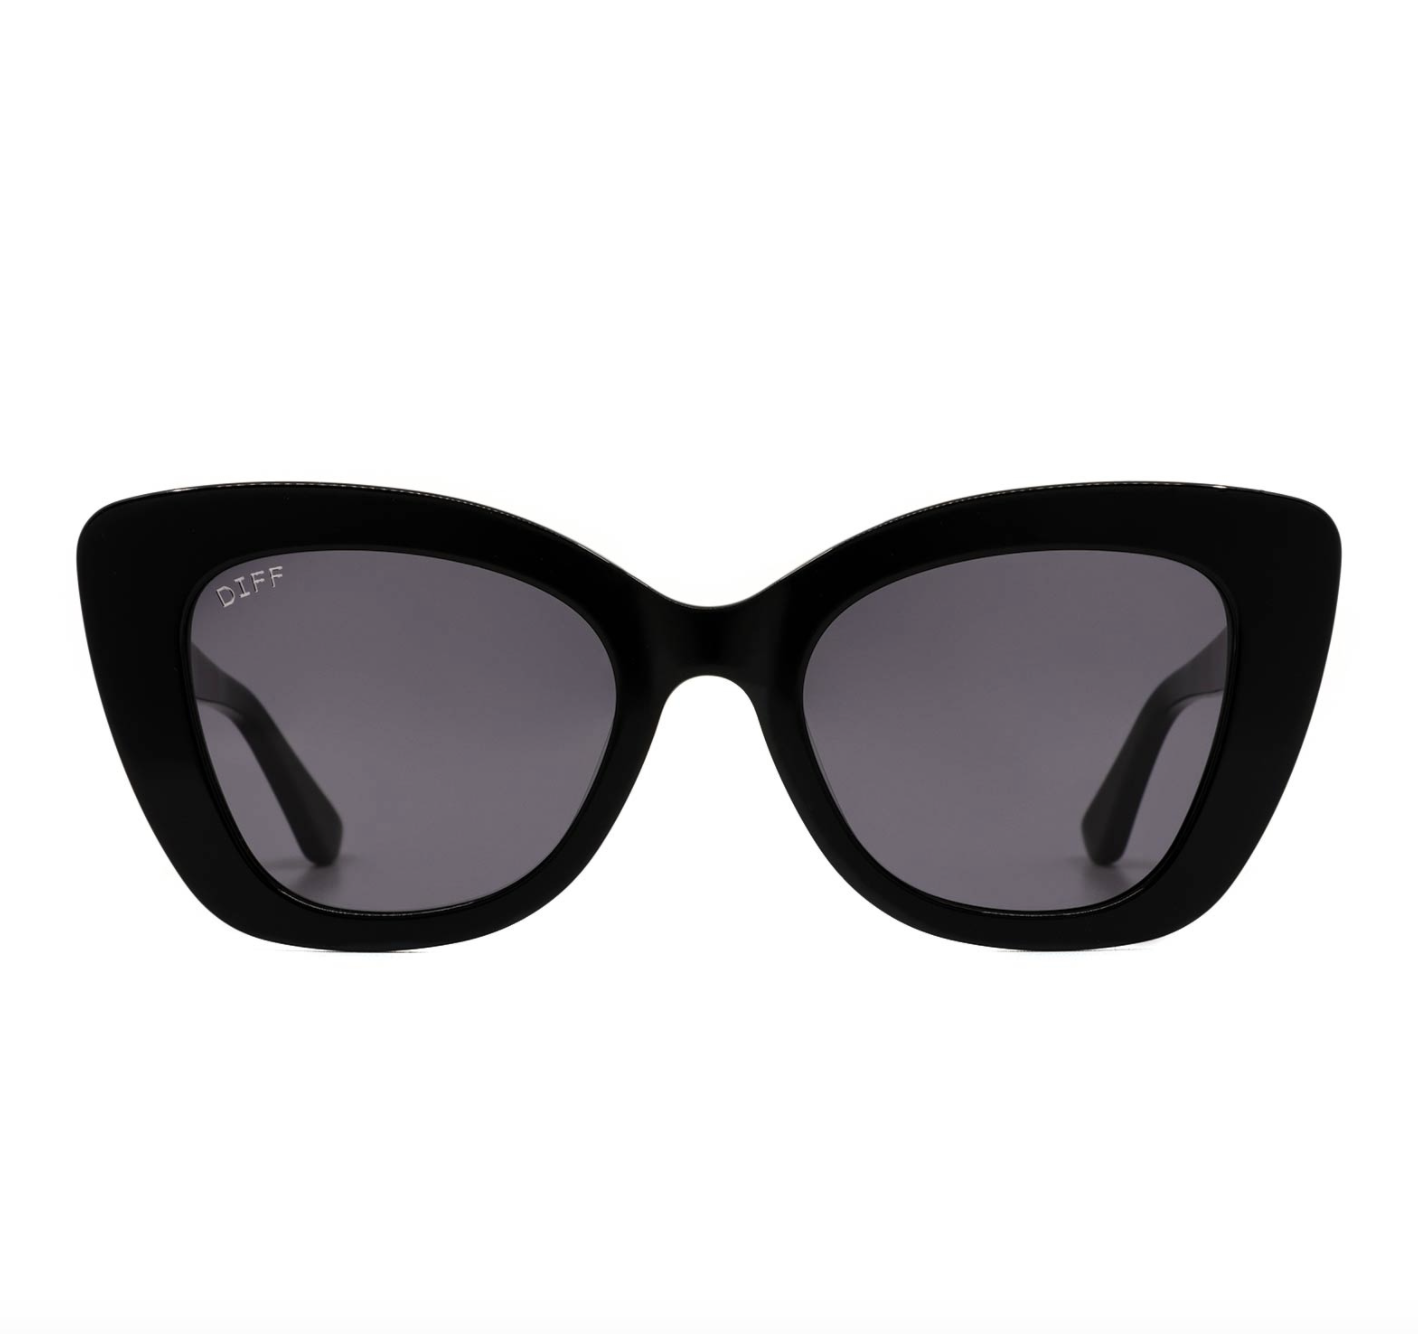 Diff Charitable Eyewear Raven